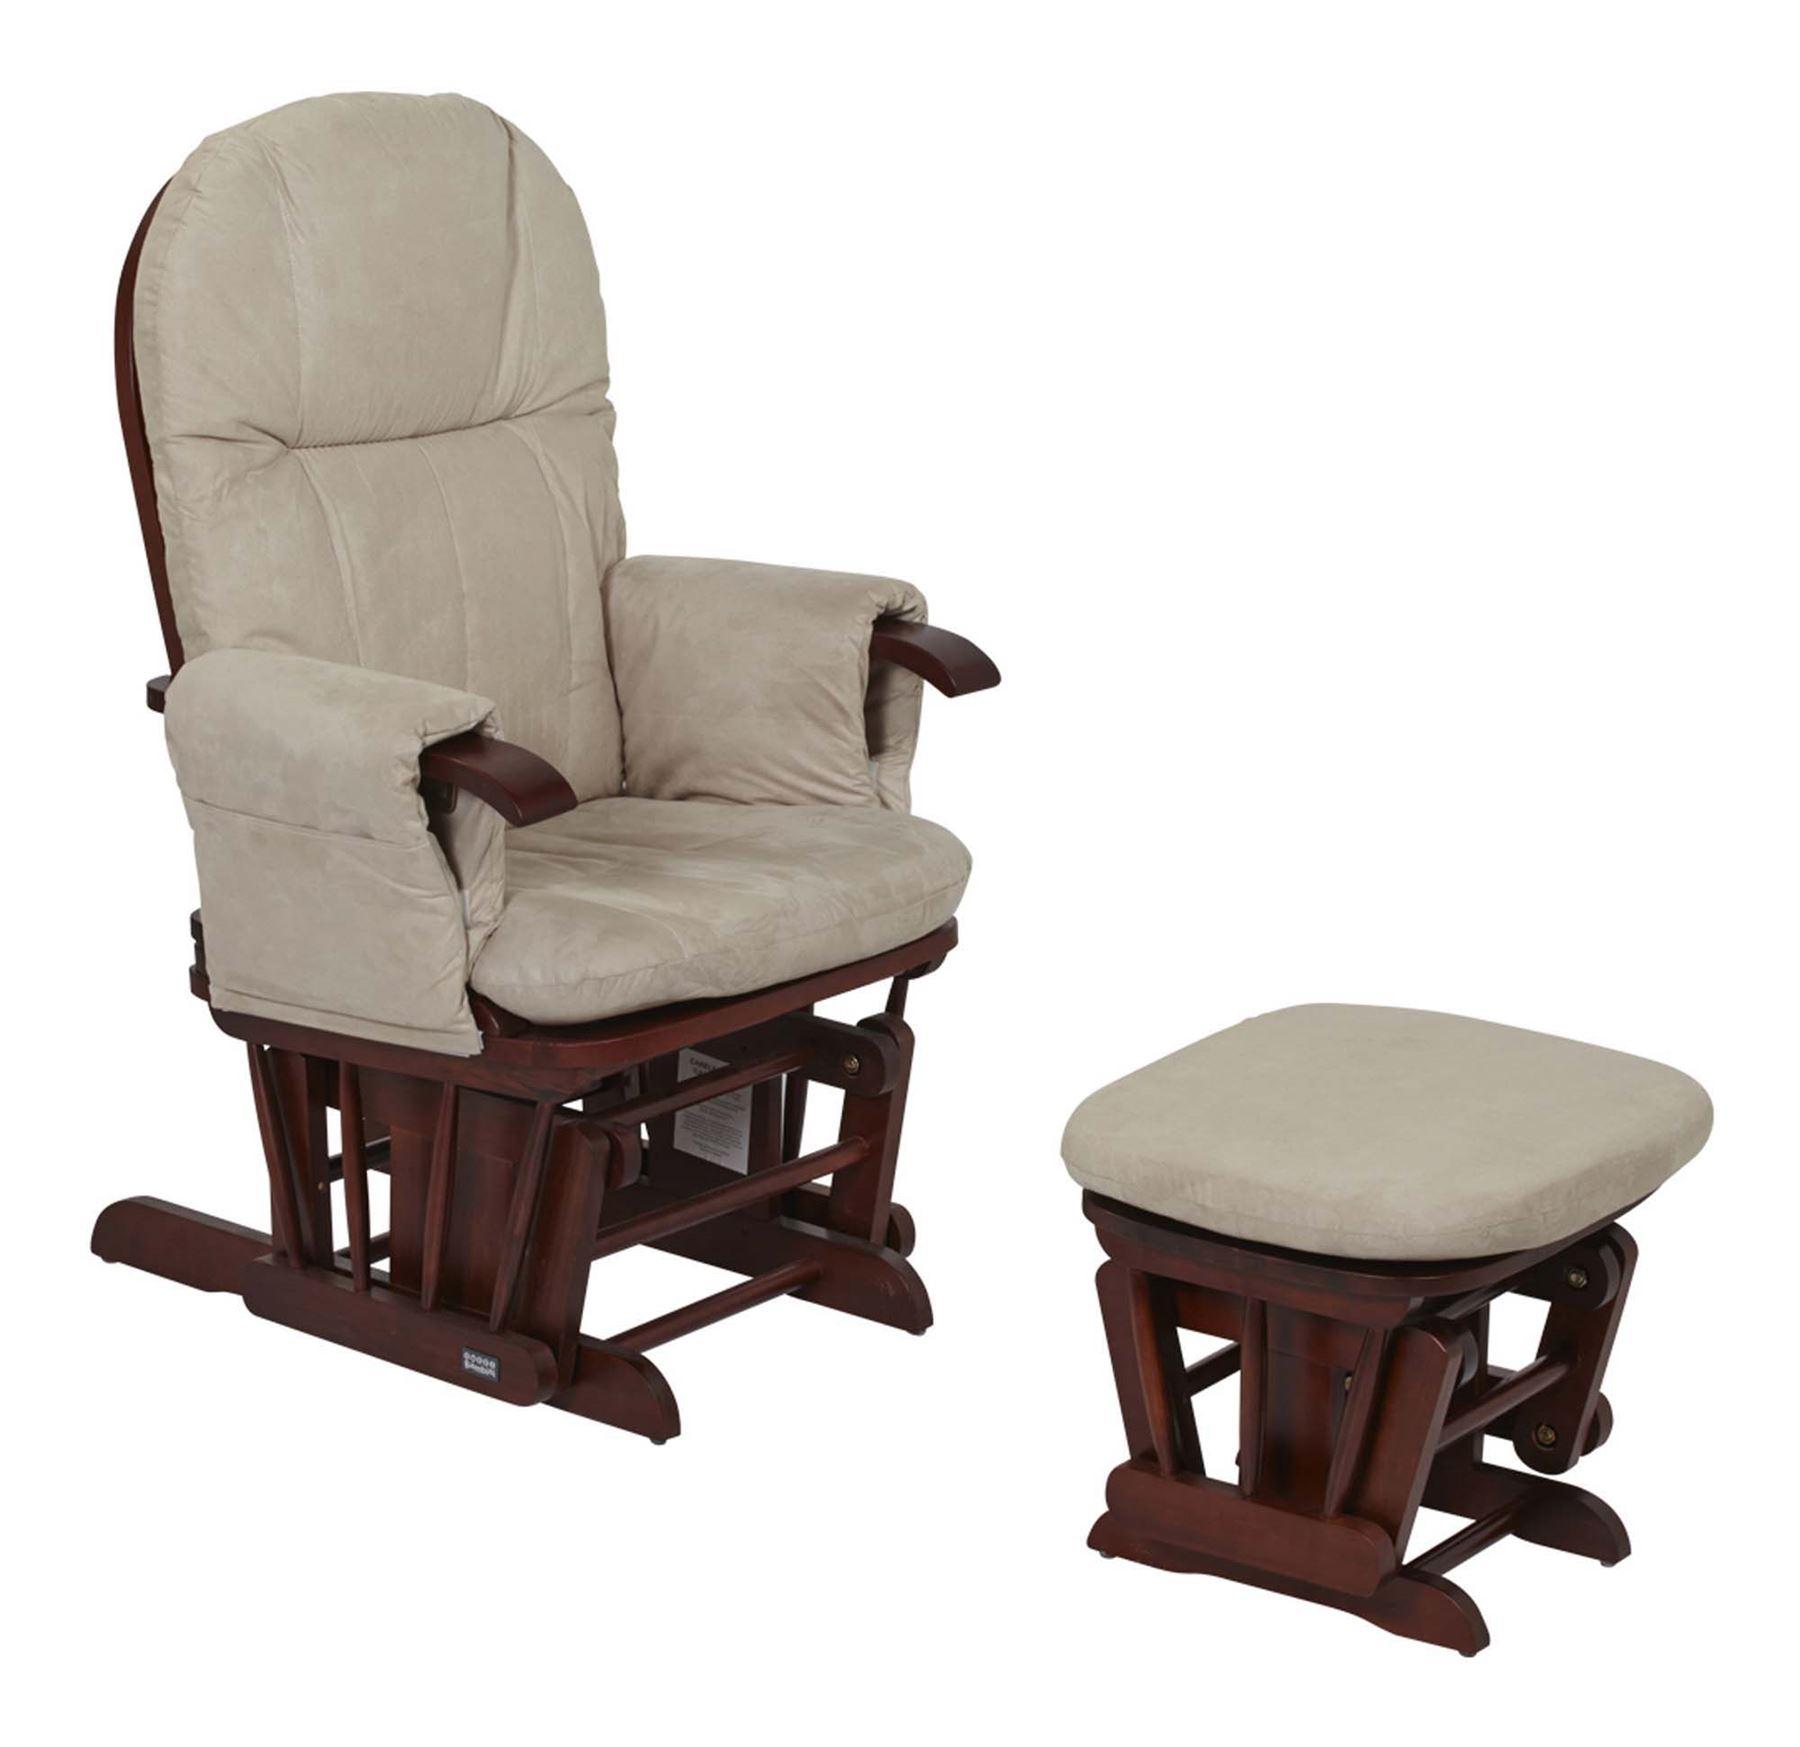 Amazing Details About Tutti Bambini Gc35 Glider Chair Stool Walnut Child Nursery Furniture Bn Squirreltailoven Fun Painted Chair Ideas Images Squirreltailovenorg